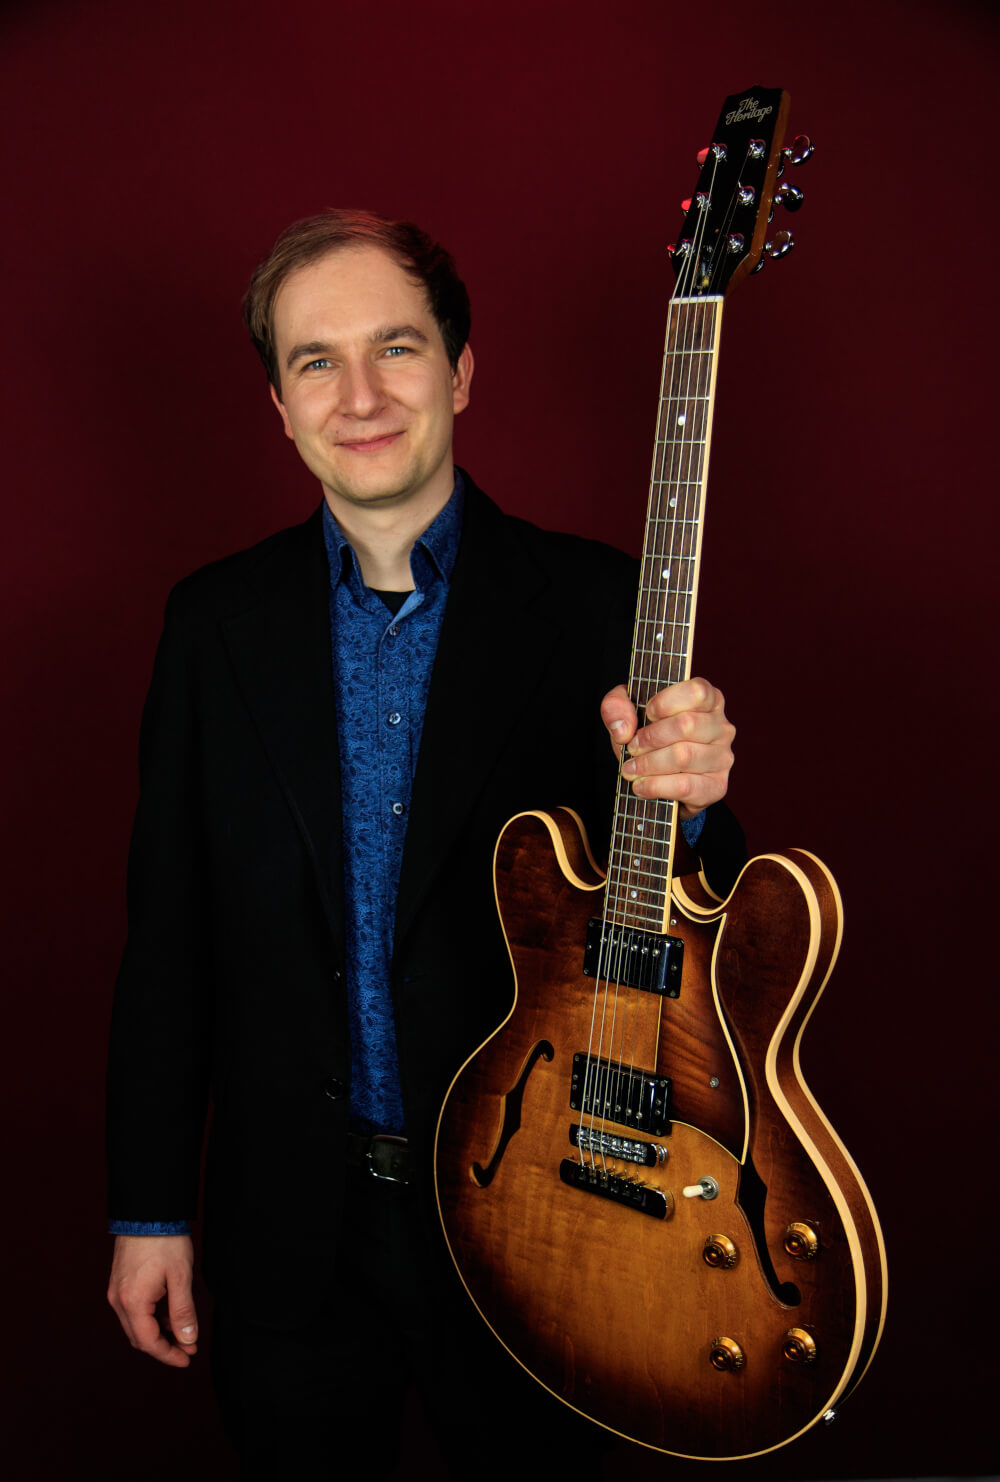 musiker-jazzduo-leipzig-jazzgitarre-christian-haupt